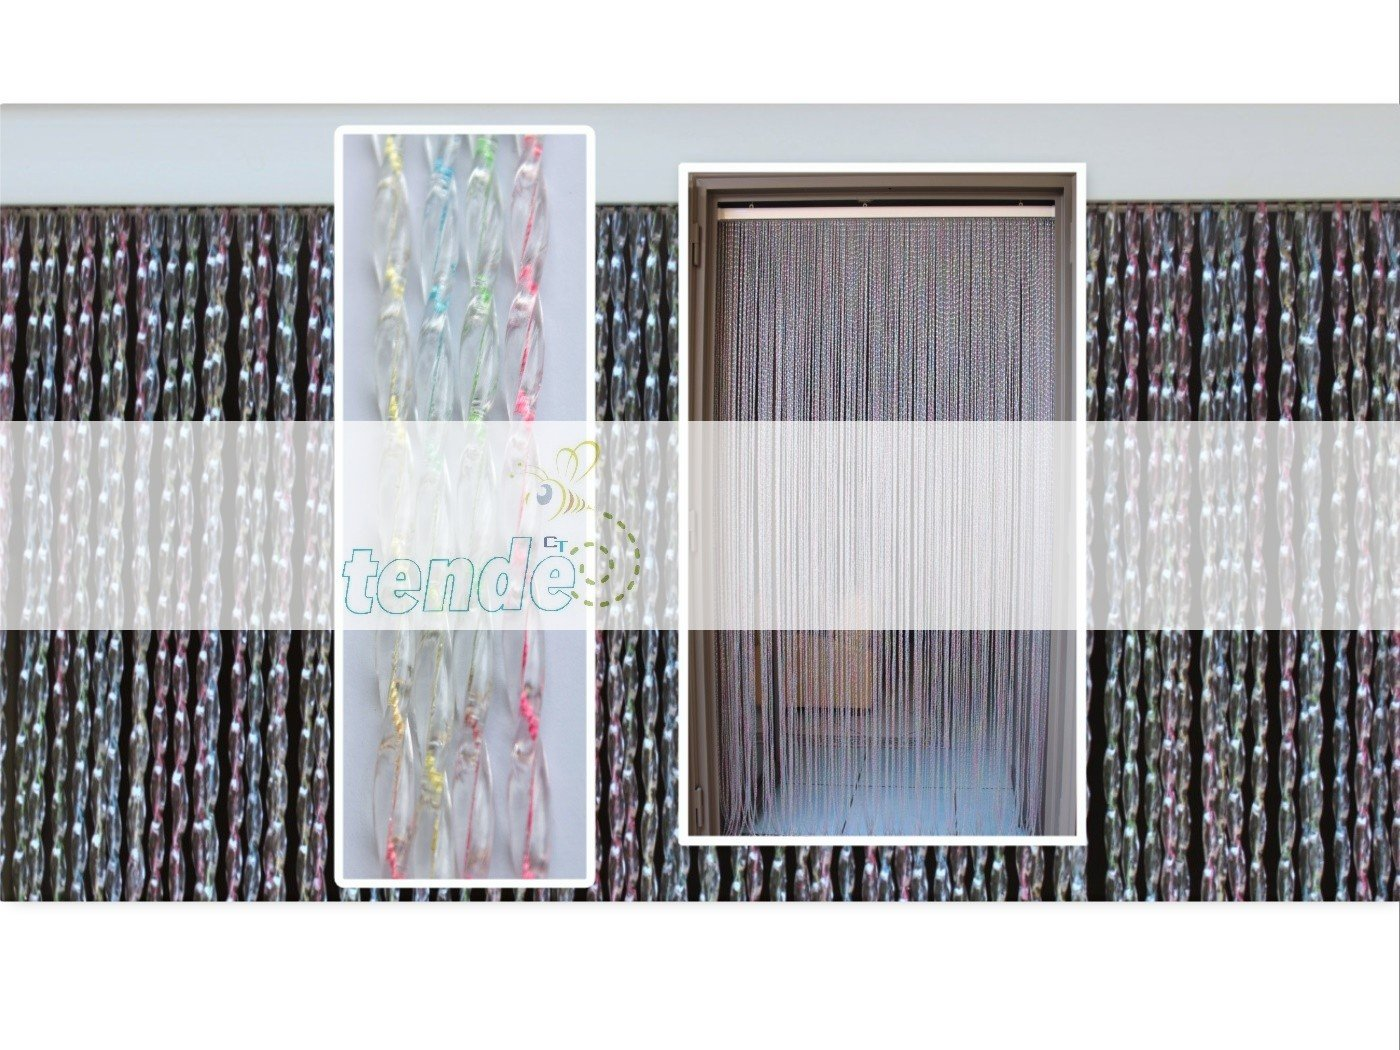 PVC-Türvorhänge Modell Roma – Aluminiumträger - Made in    - Eichmaß (95X200 100X220 120X230 130X240 150X250) – Fliegenvorhang (100X220, Transparent (2)) B01GA9MDPE Fensterdekoration 107459